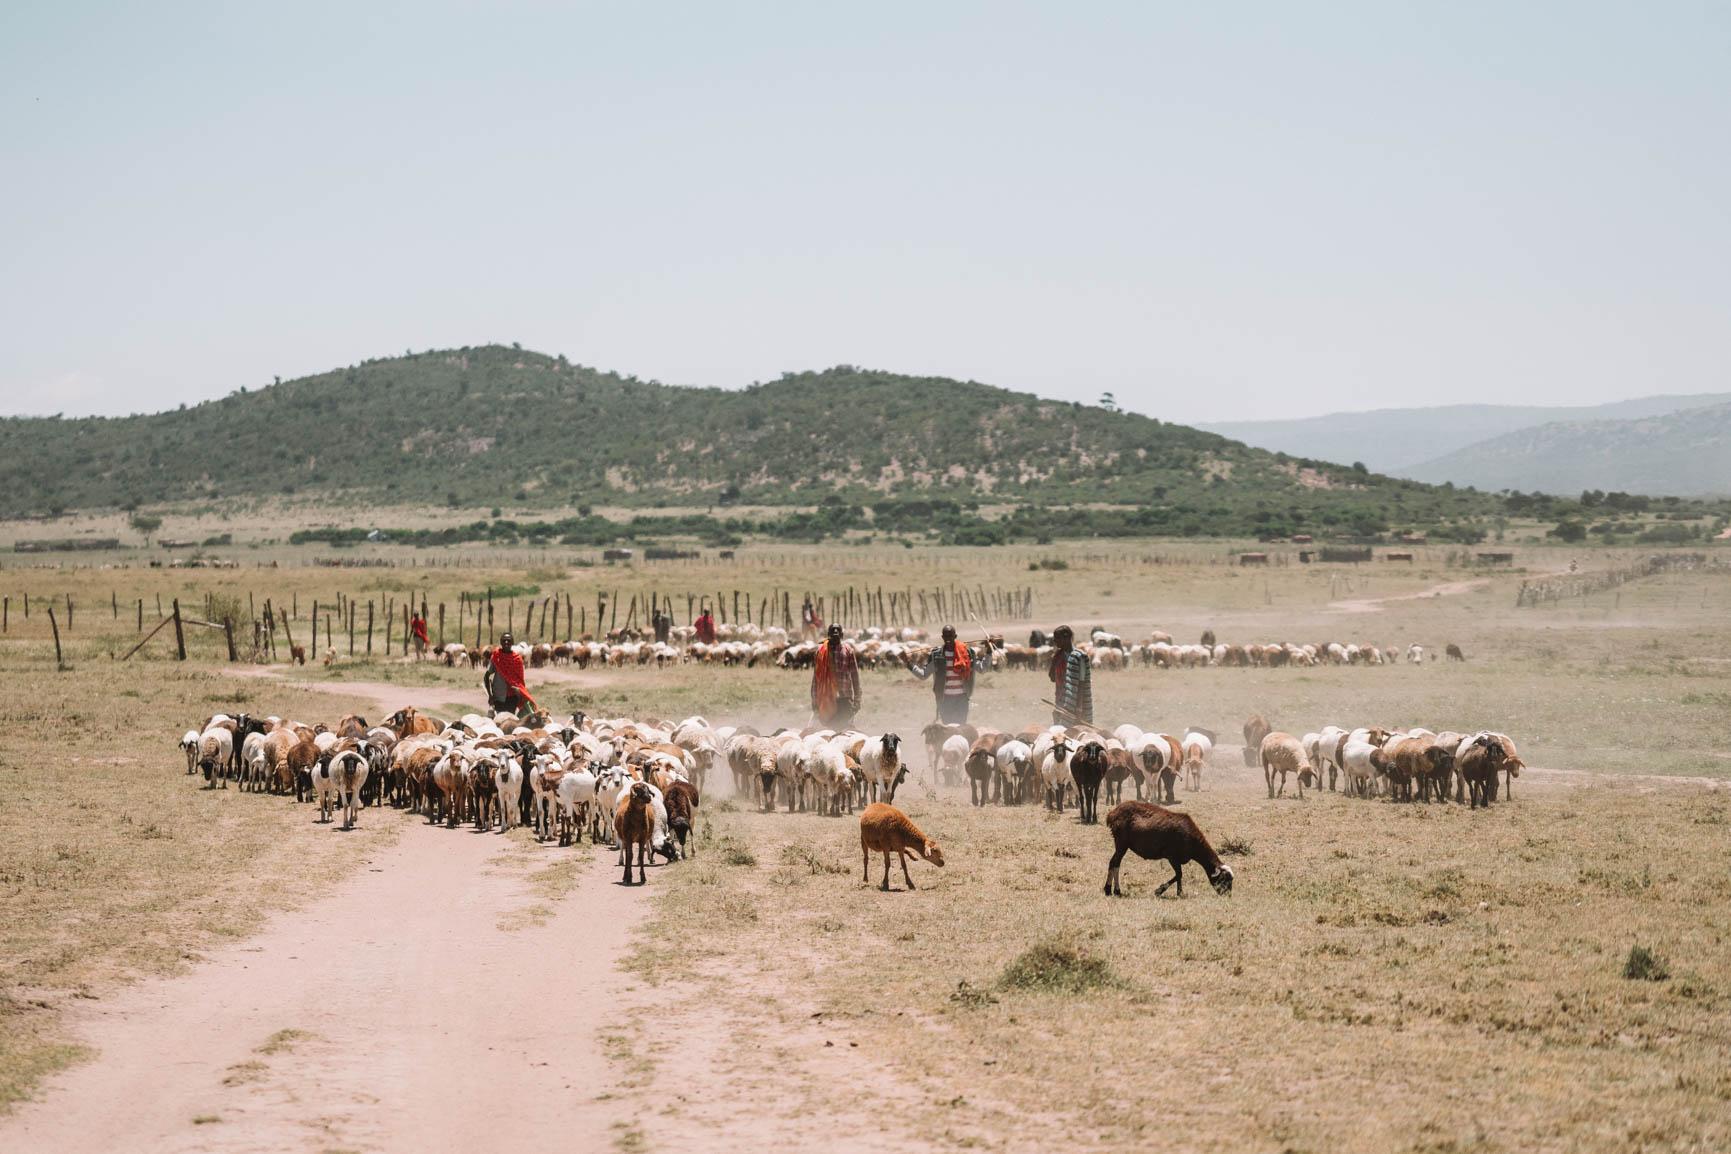 Maasai Mara Tribe herding goat Kenya